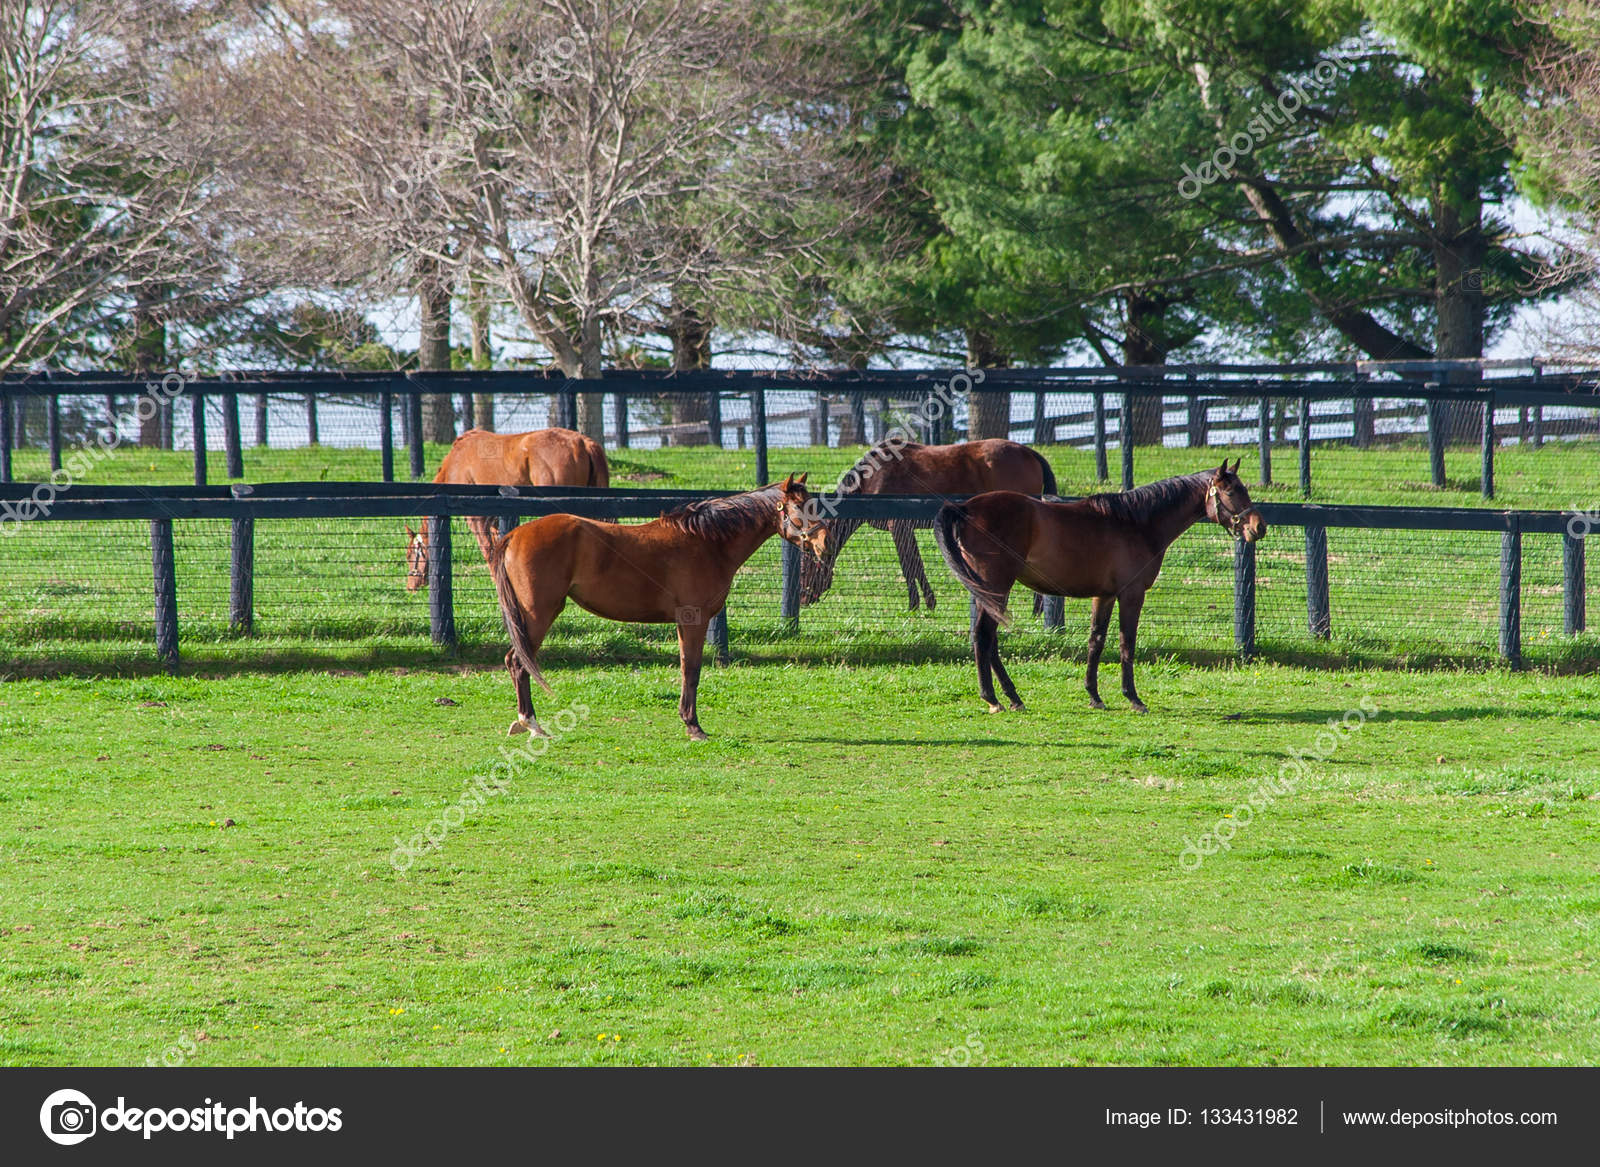 Horses at horse farm country landscape stock photo for Horse farm